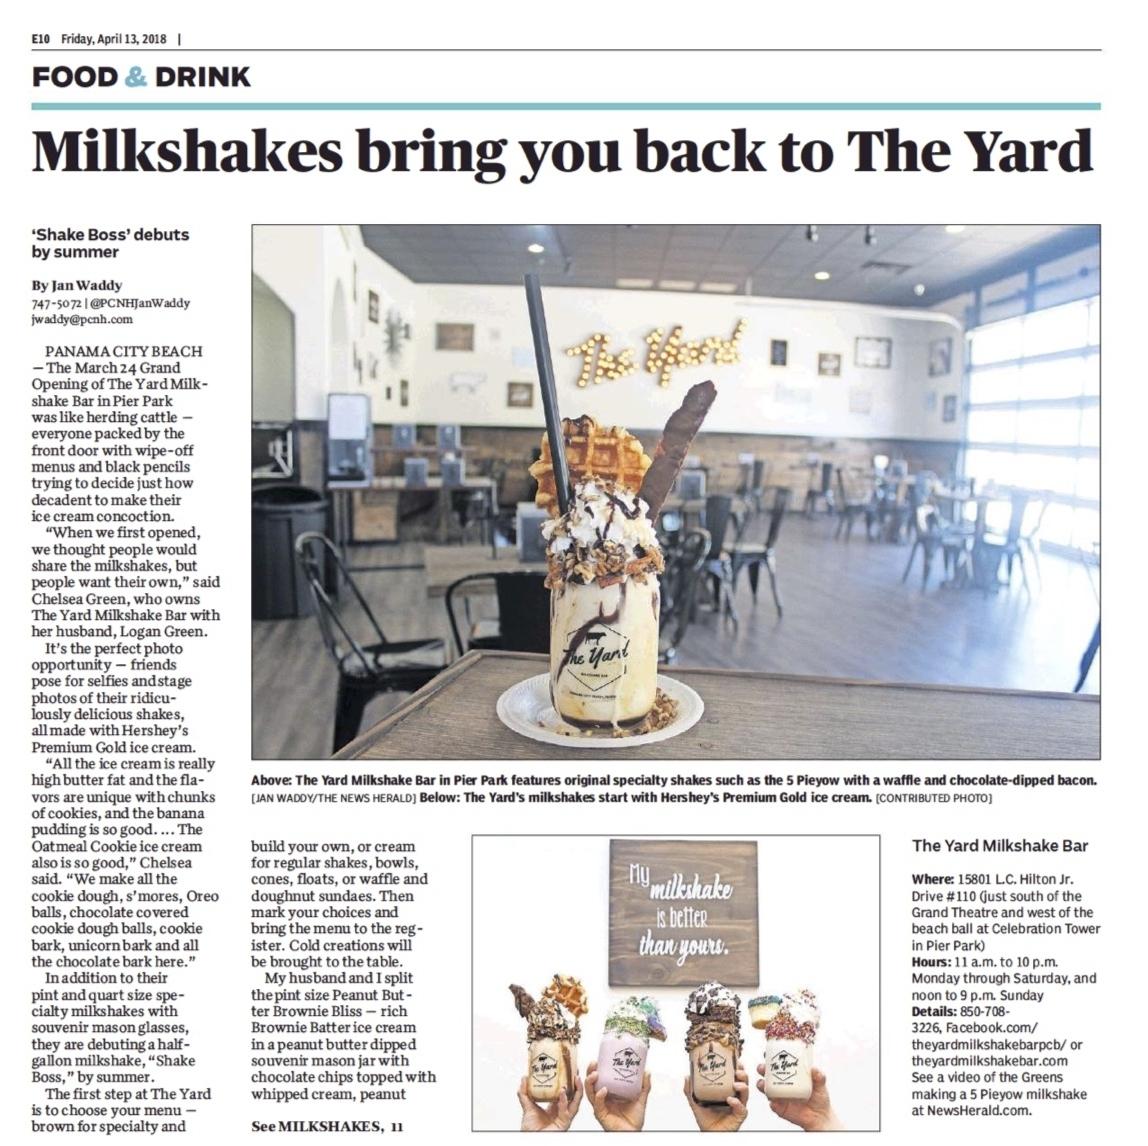 The Yard Milkshake Bar in Panama City Beach